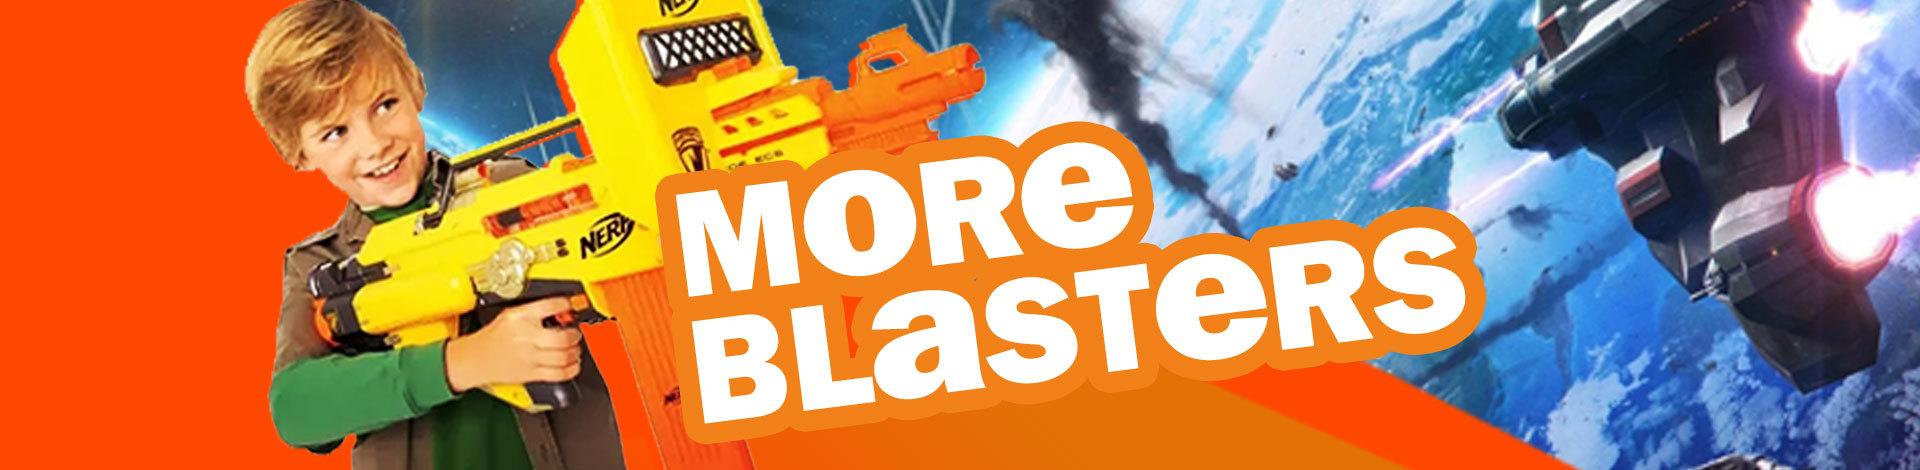 More Blasters